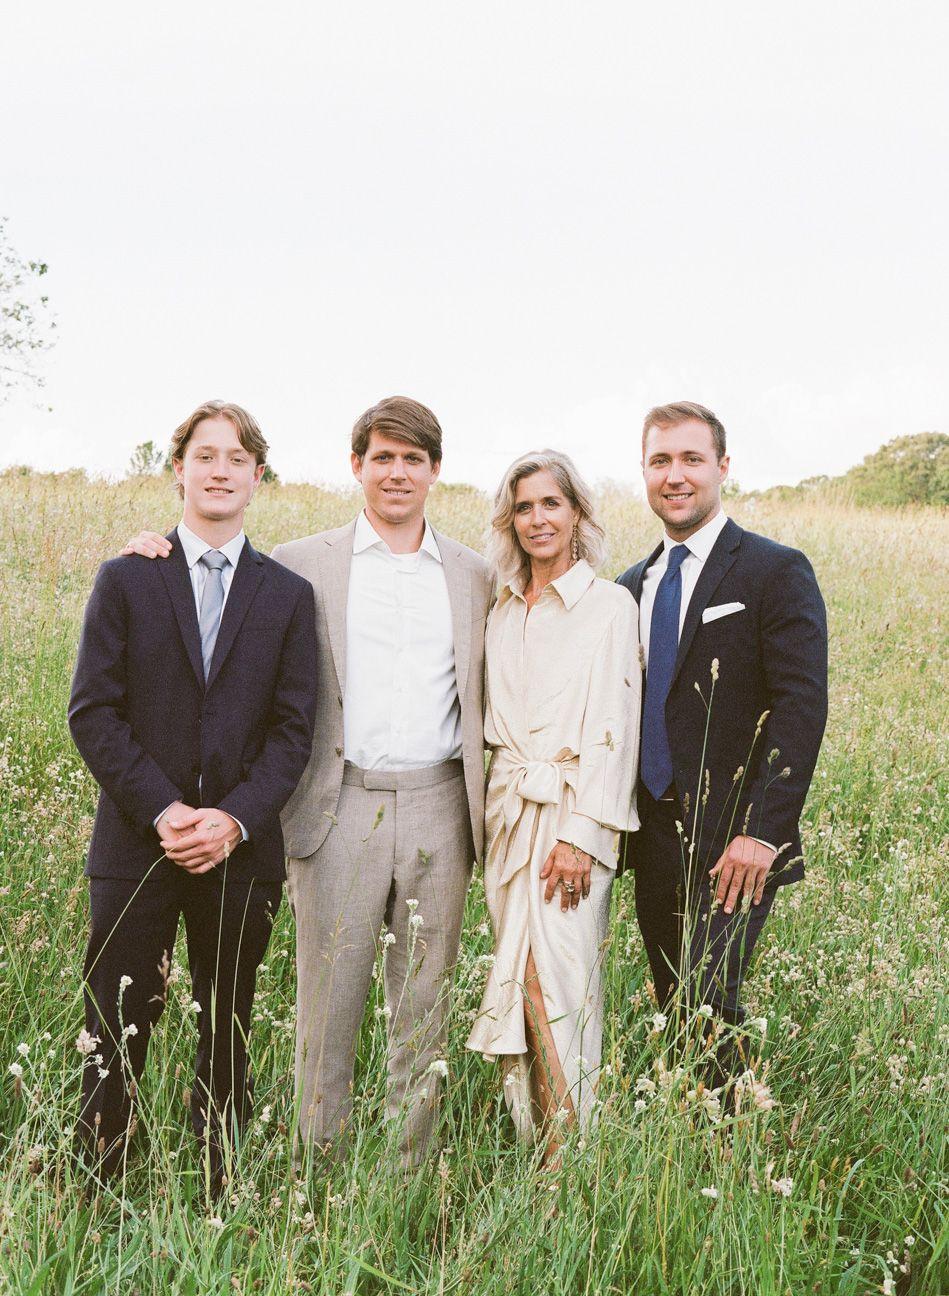 KareHillPhotography-Nassikas-Wedding-0965.jpg